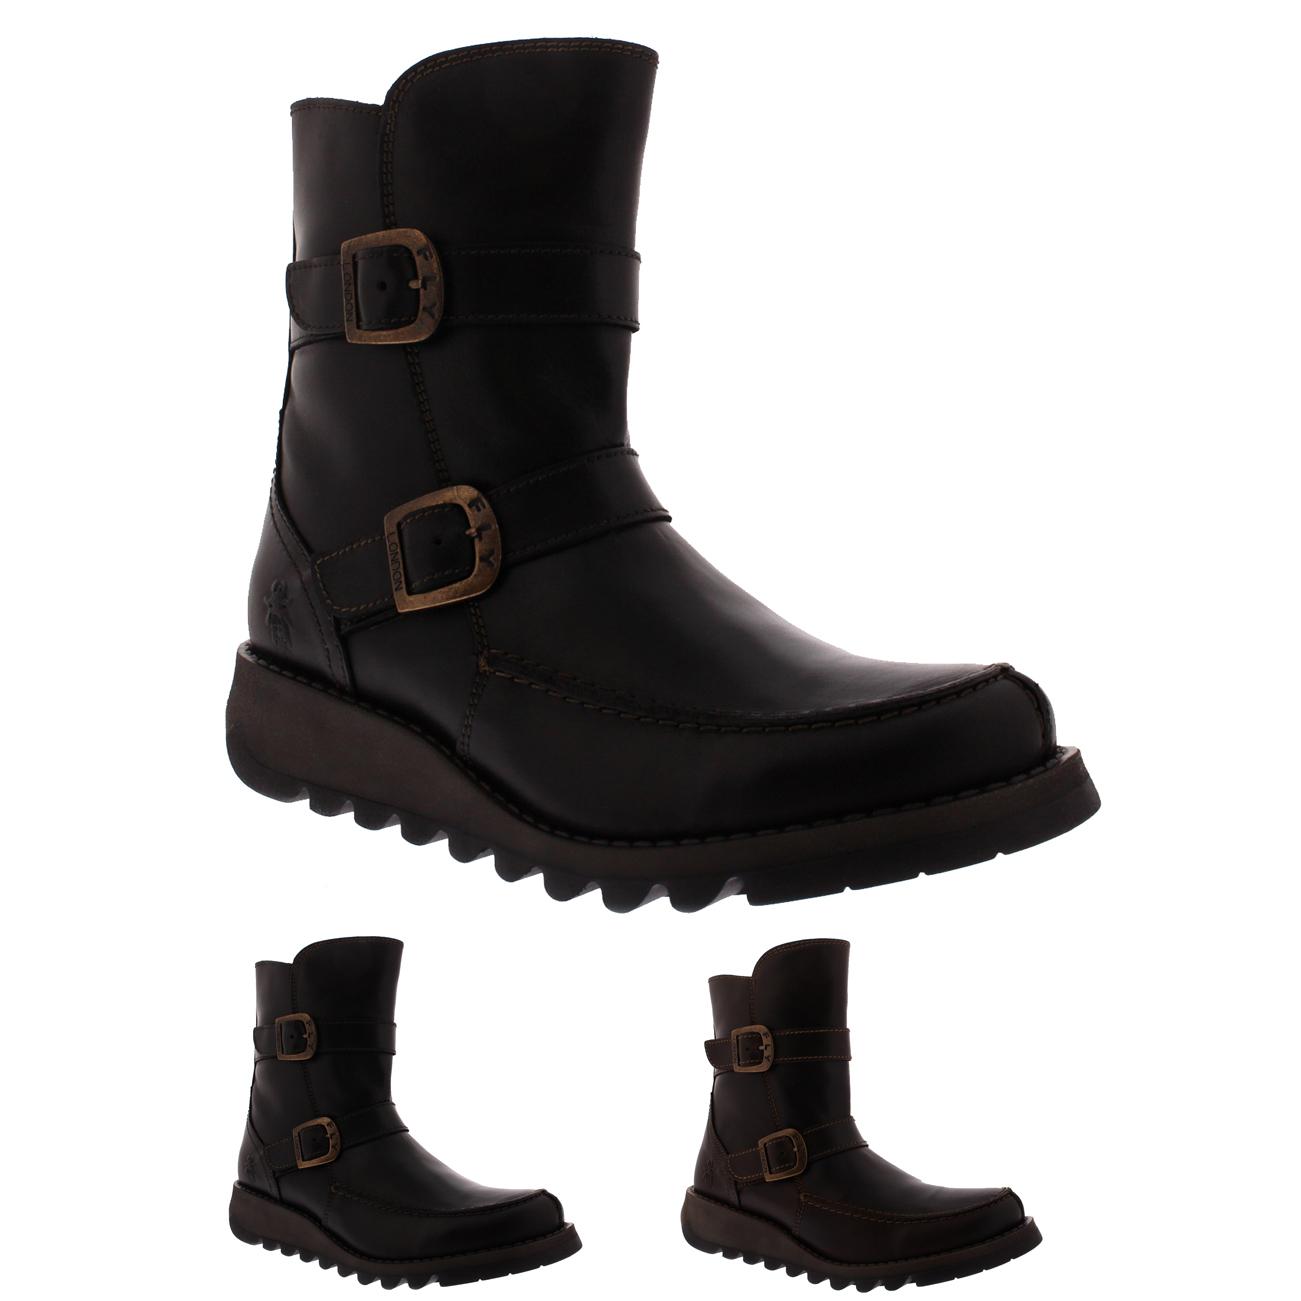 damen Fly London Sann Leather Work Fashion Casual Wedge Heel Ankle Stiefel UK 3-10